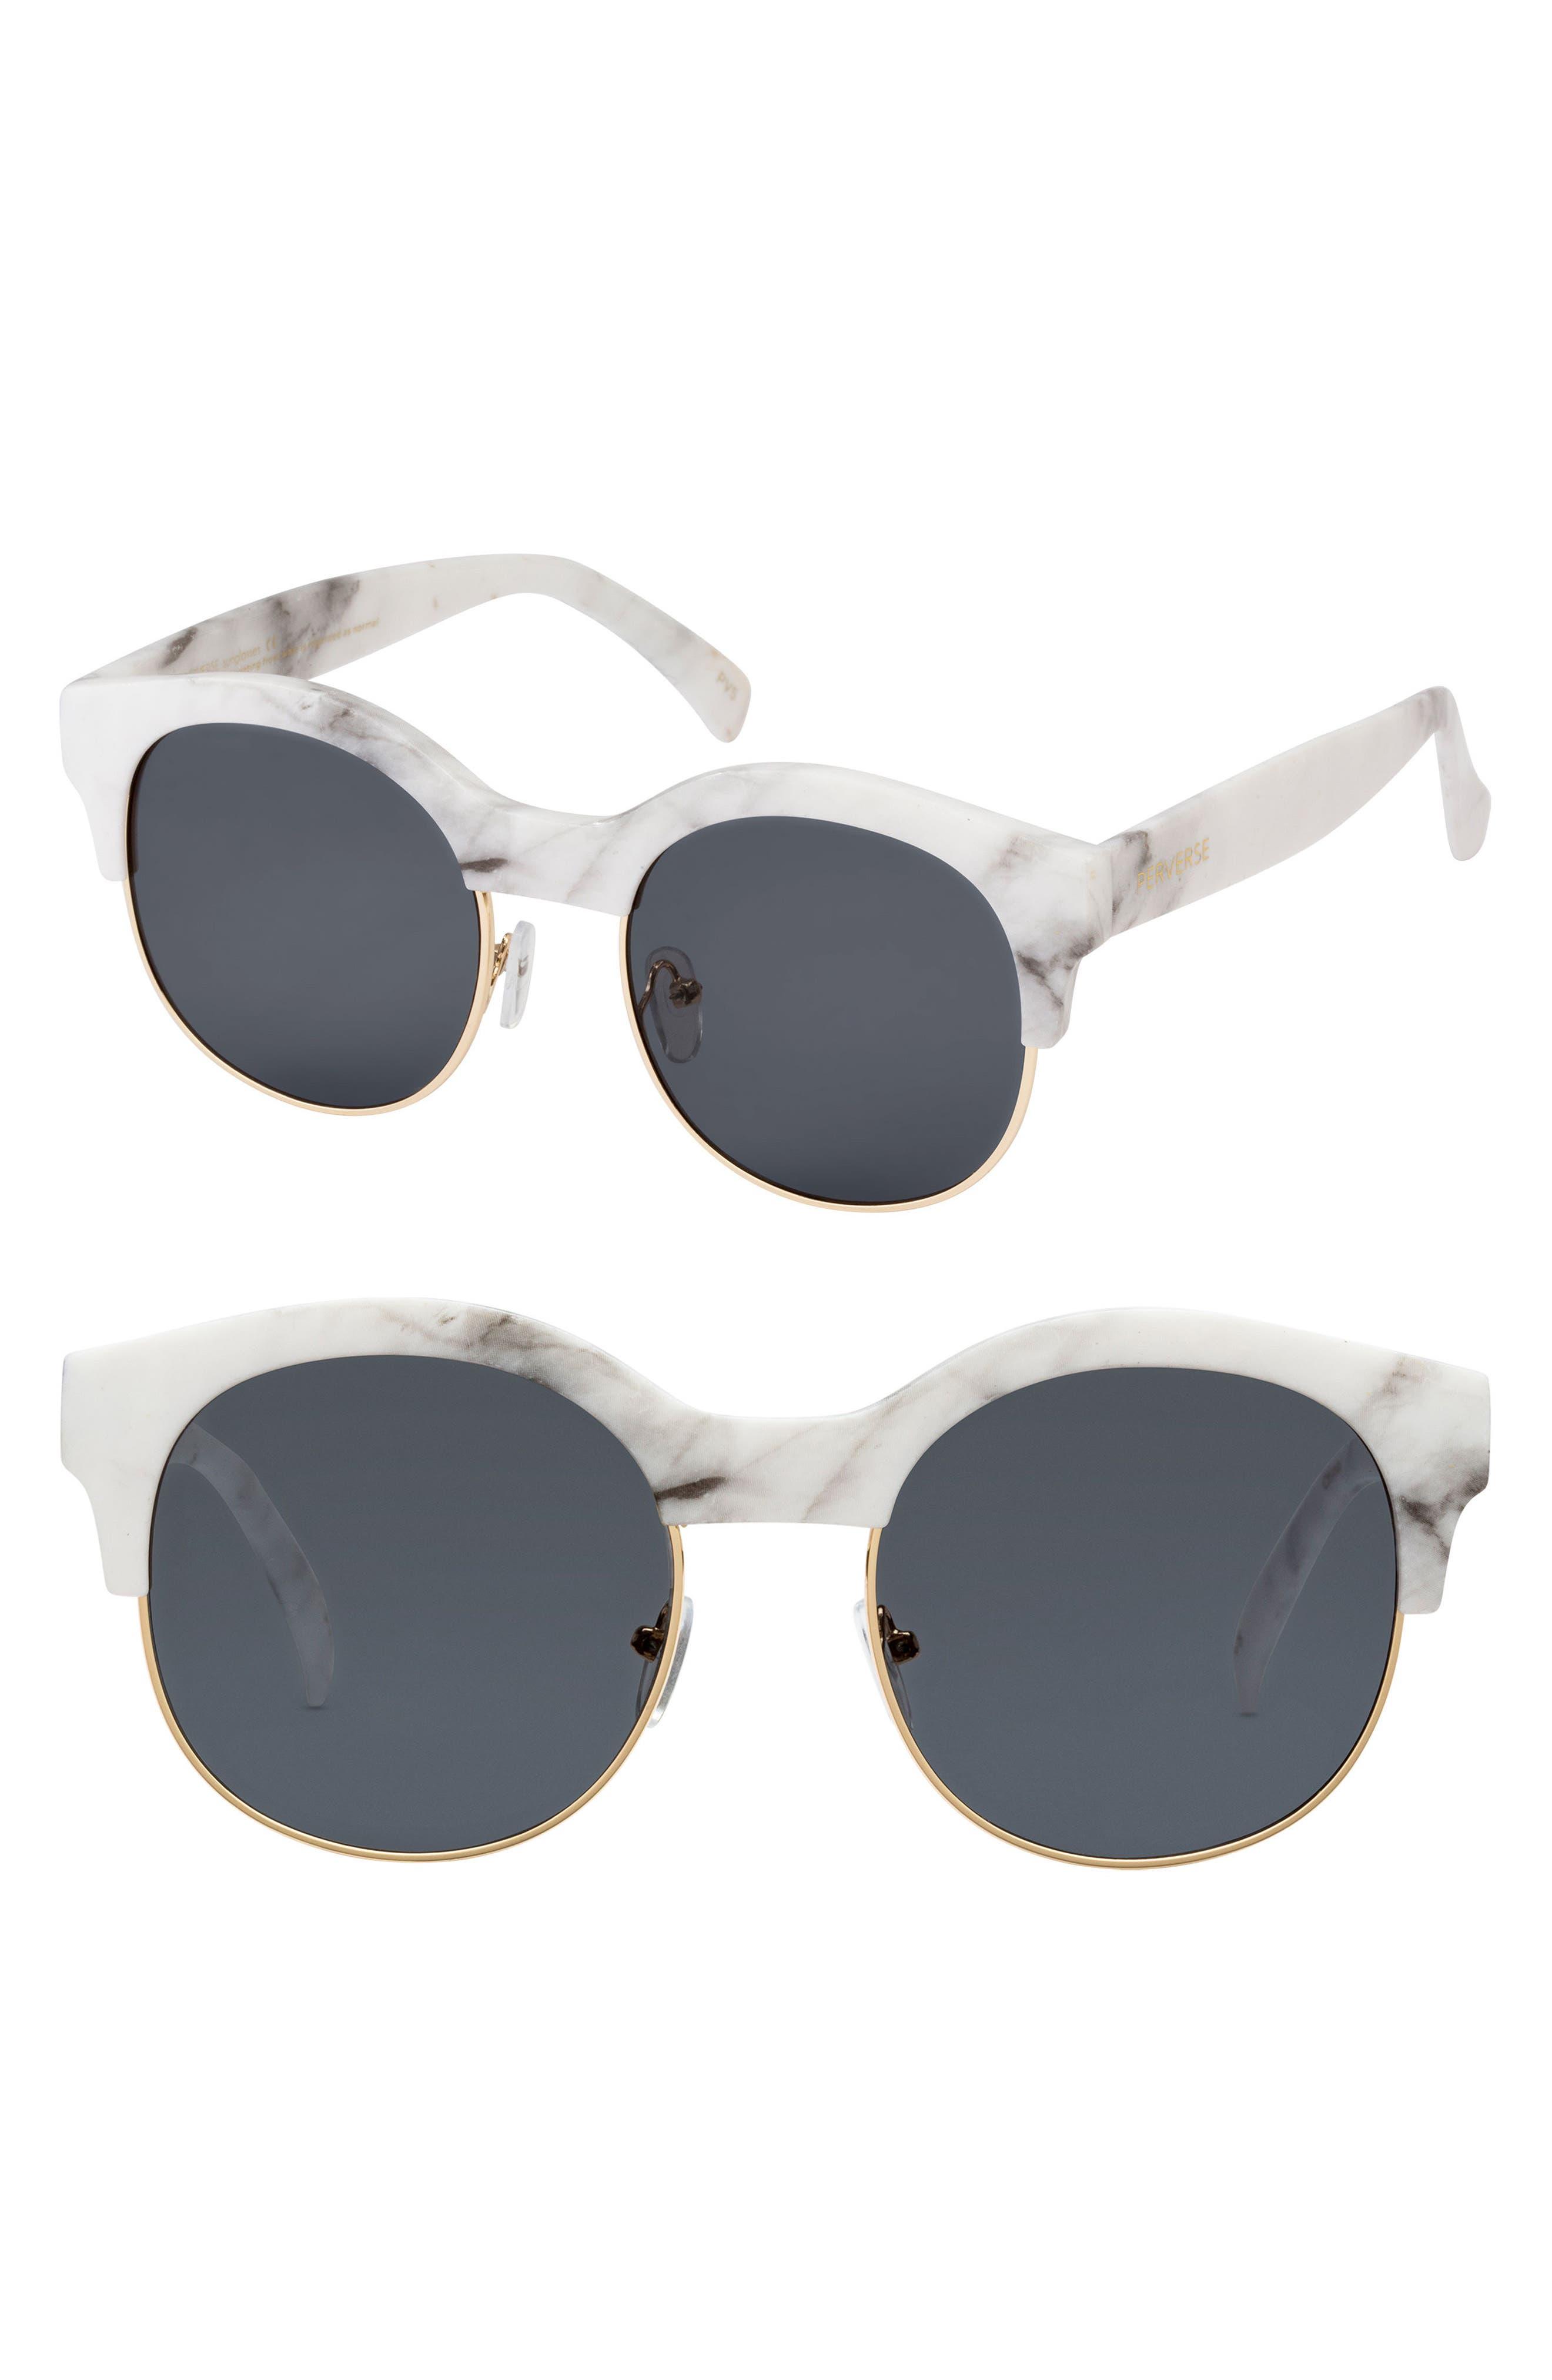 PERVERSE Greek 50mm Round Sunglasses